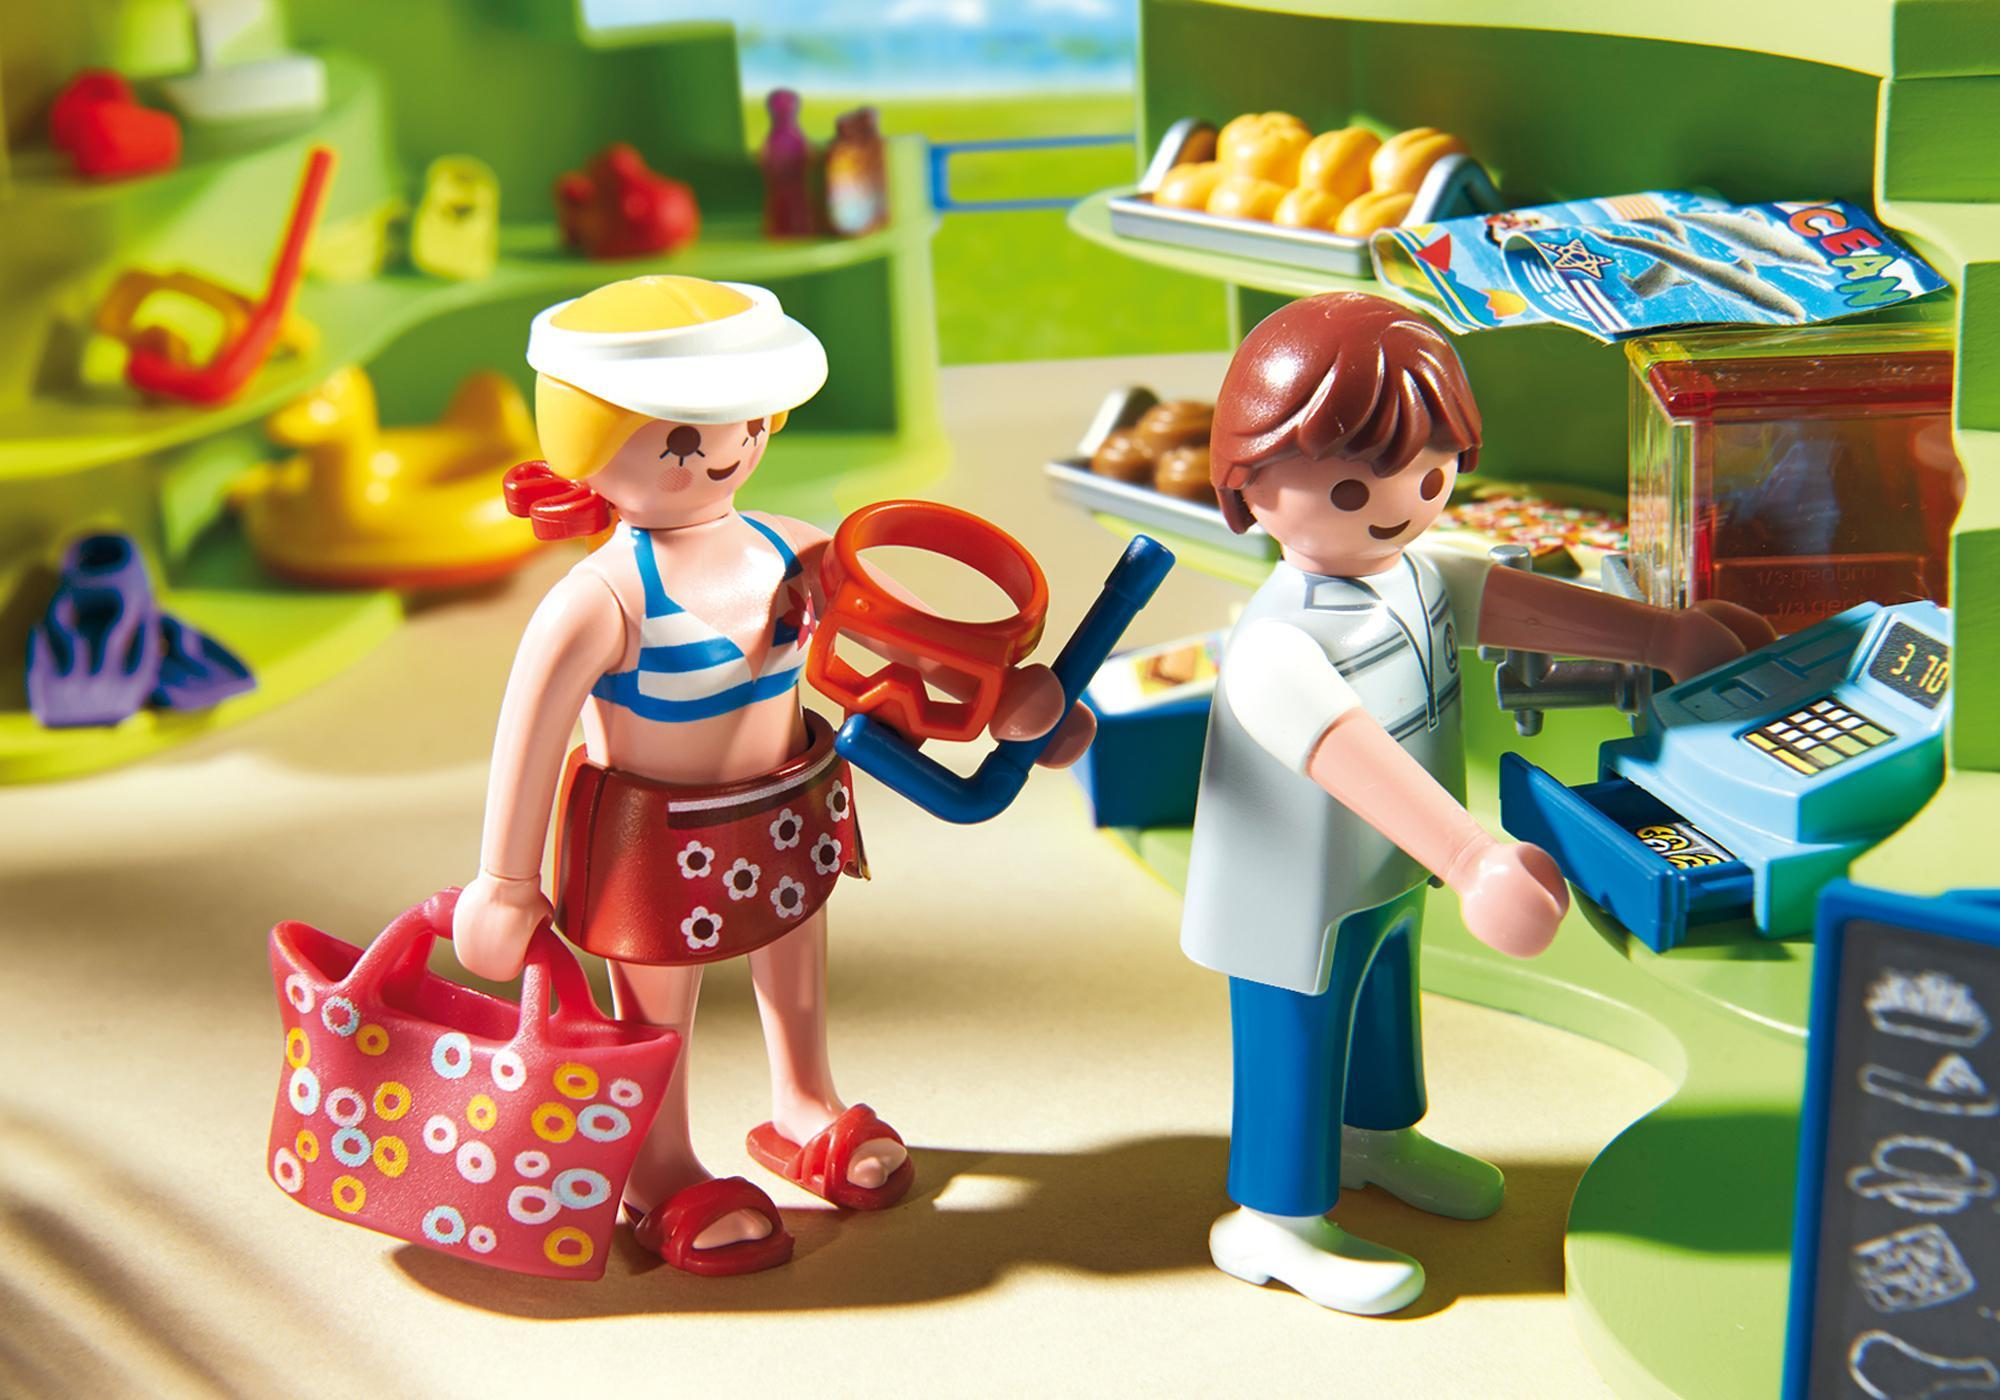 http://media.playmobil.com/i/playmobil/6672_product_extra1/Espace boutique et fast-food